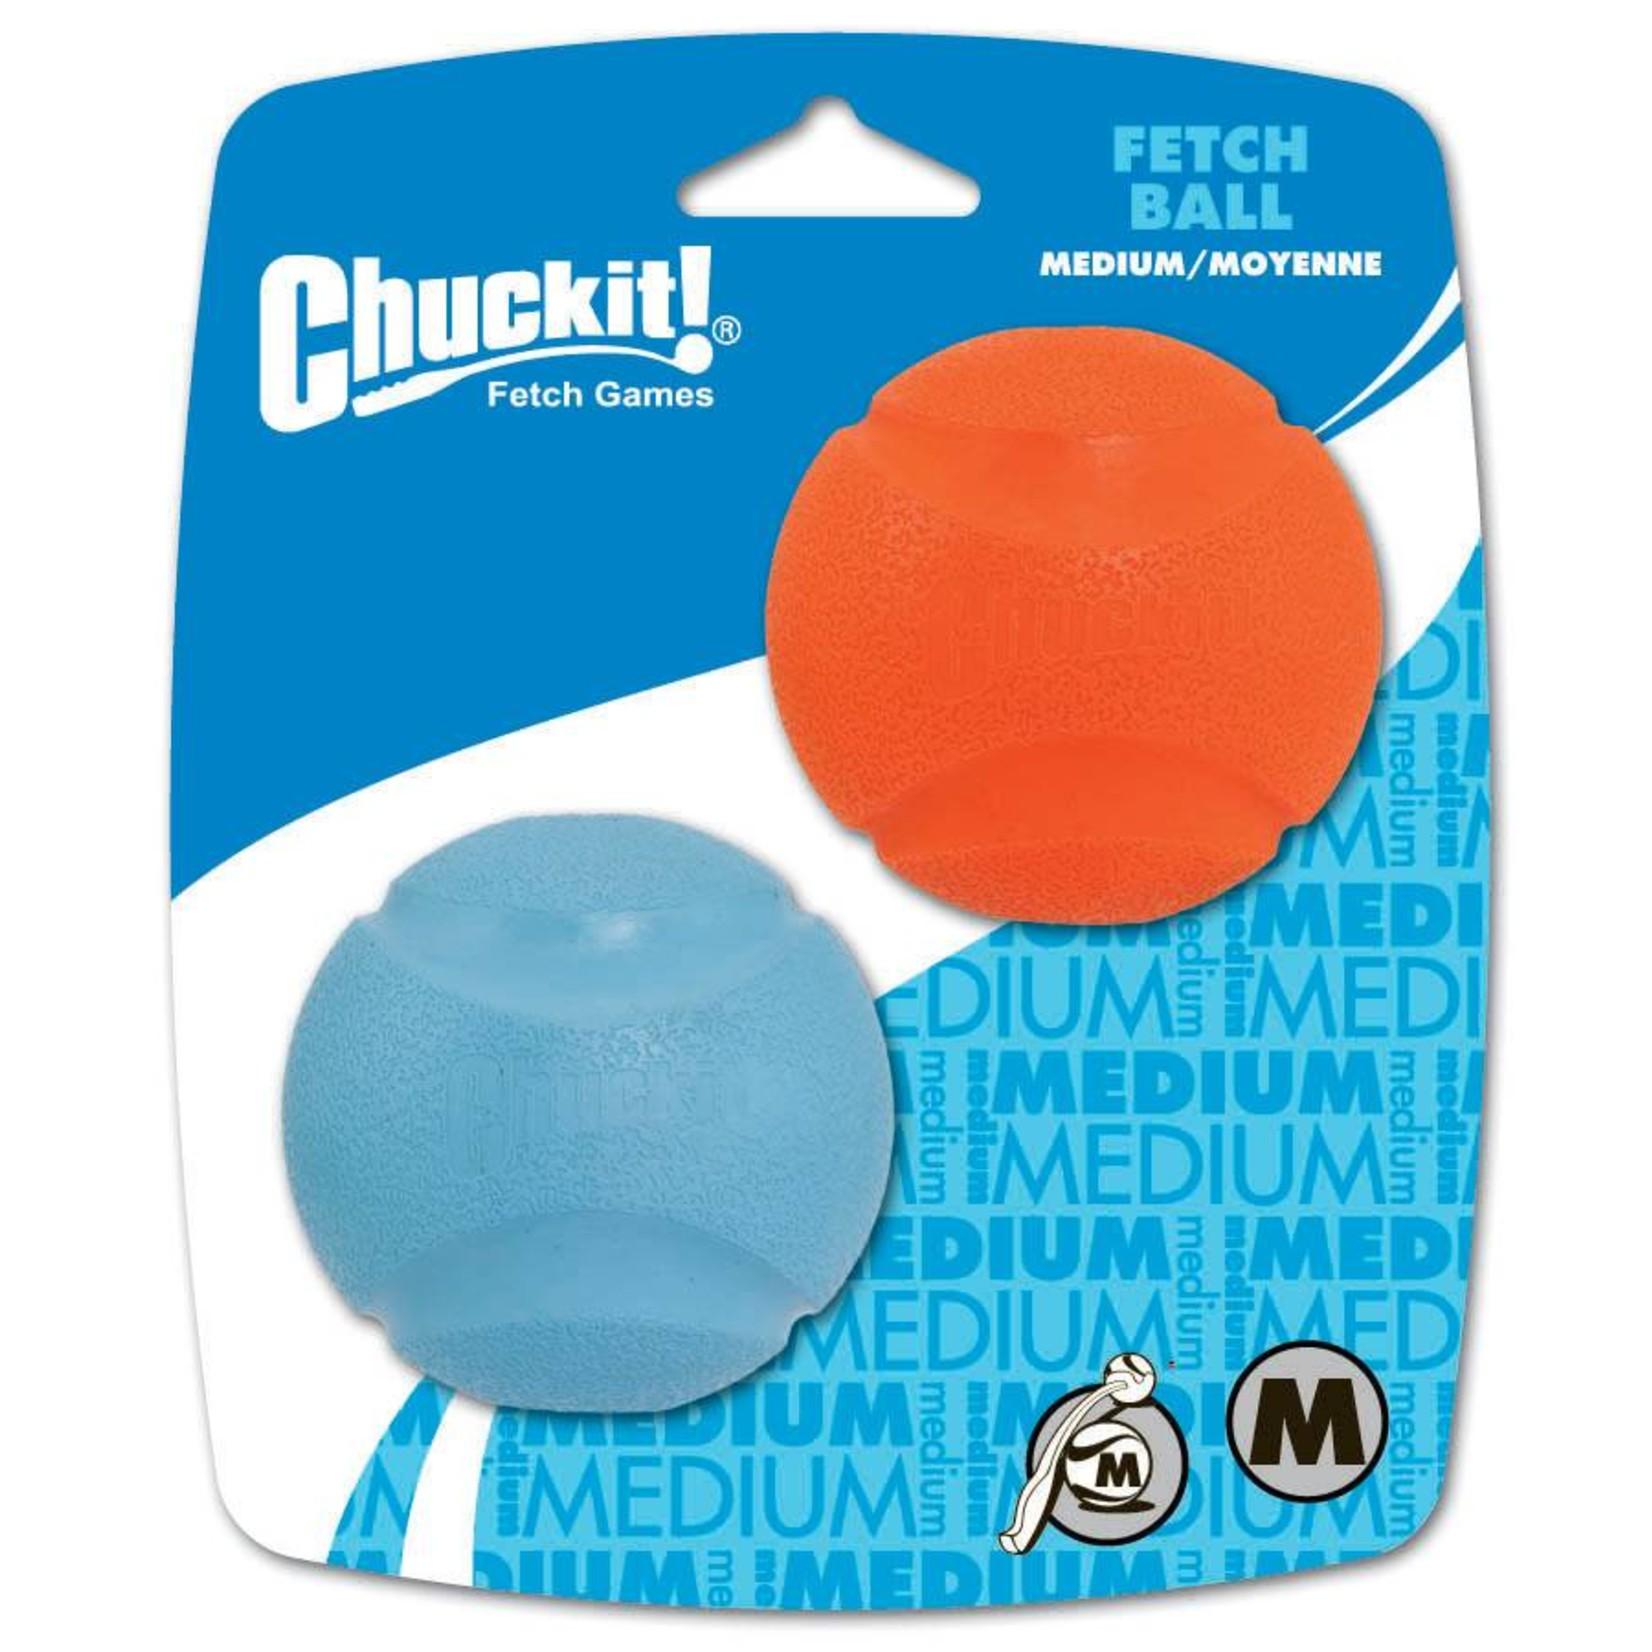 Chuckit! Fetch Ball Dog Toy, Medium 6.5cm, 2 pack